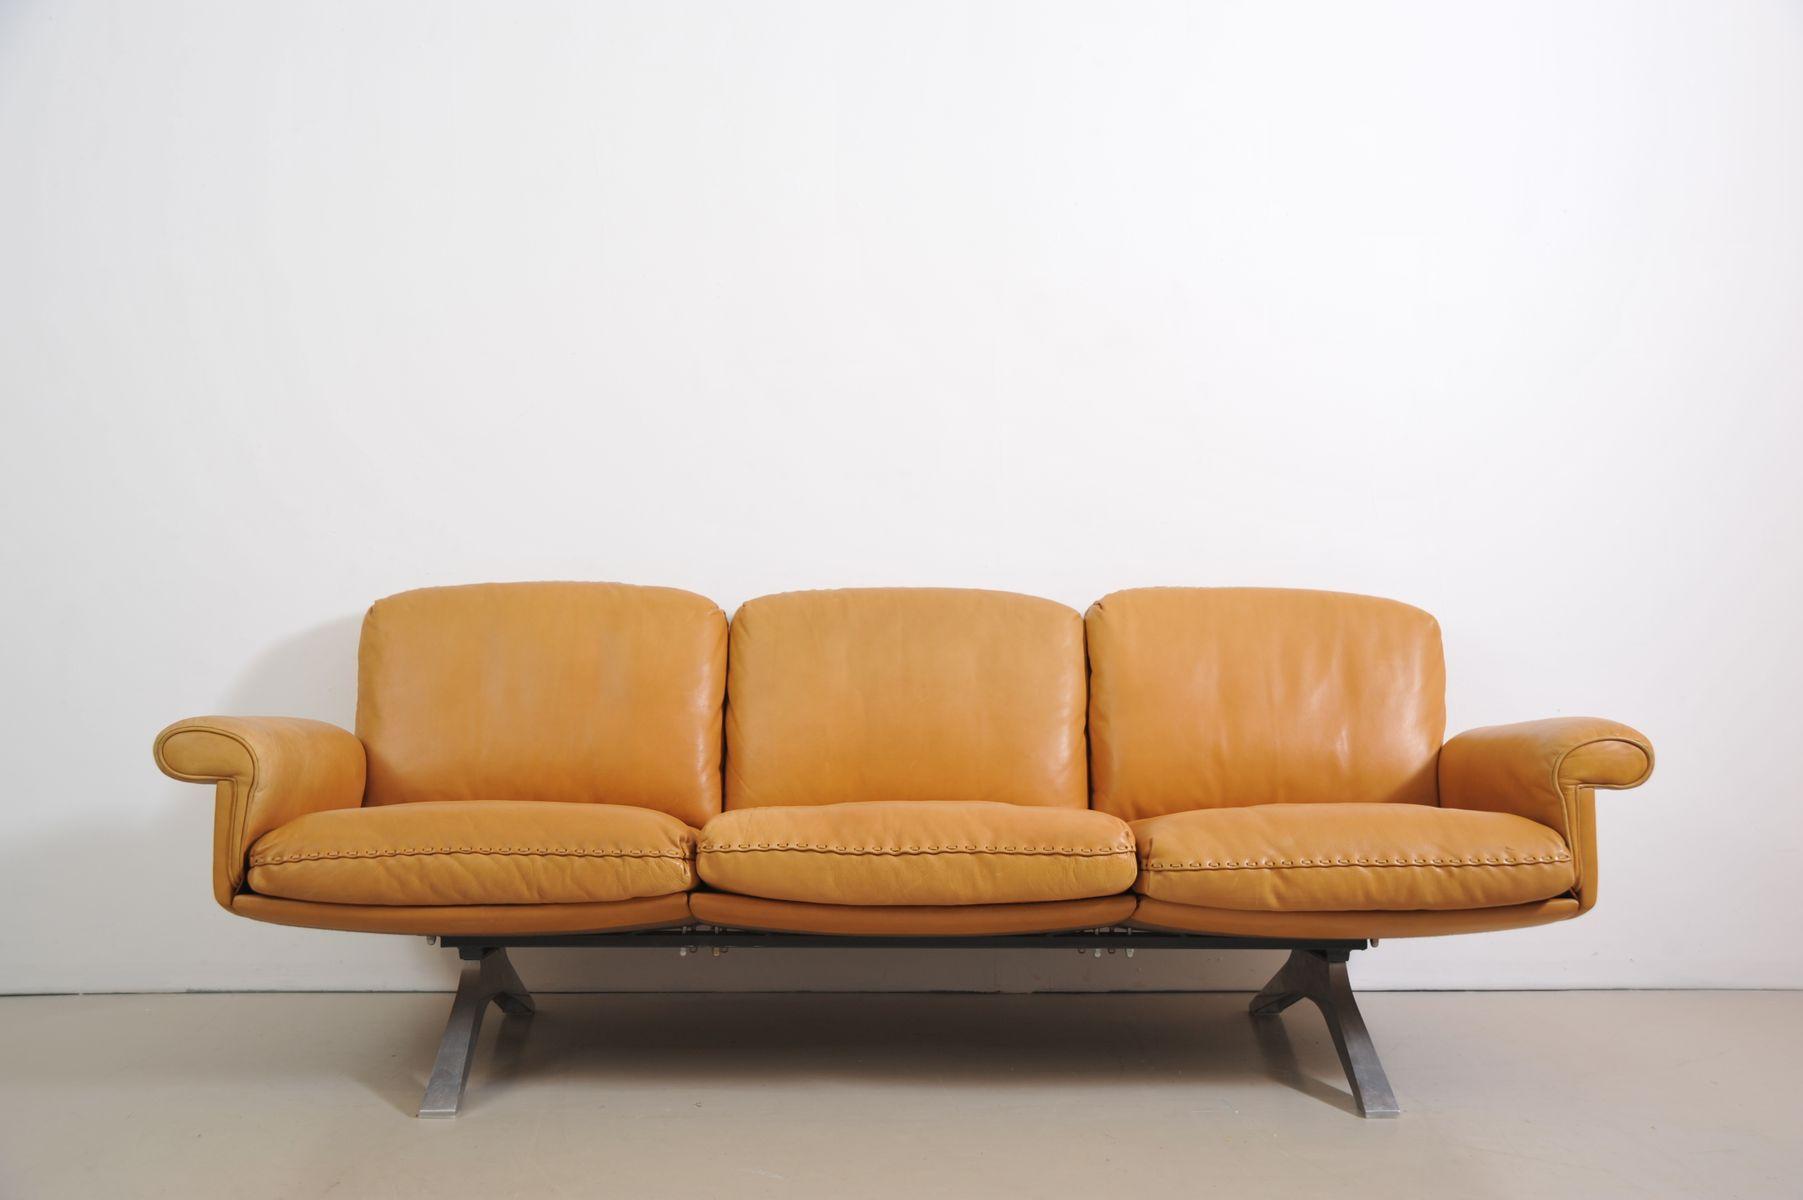 vintage ds 31 sofa from de sede for sale at pamono. Black Bedroom Furniture Sets. Home Design Ideas